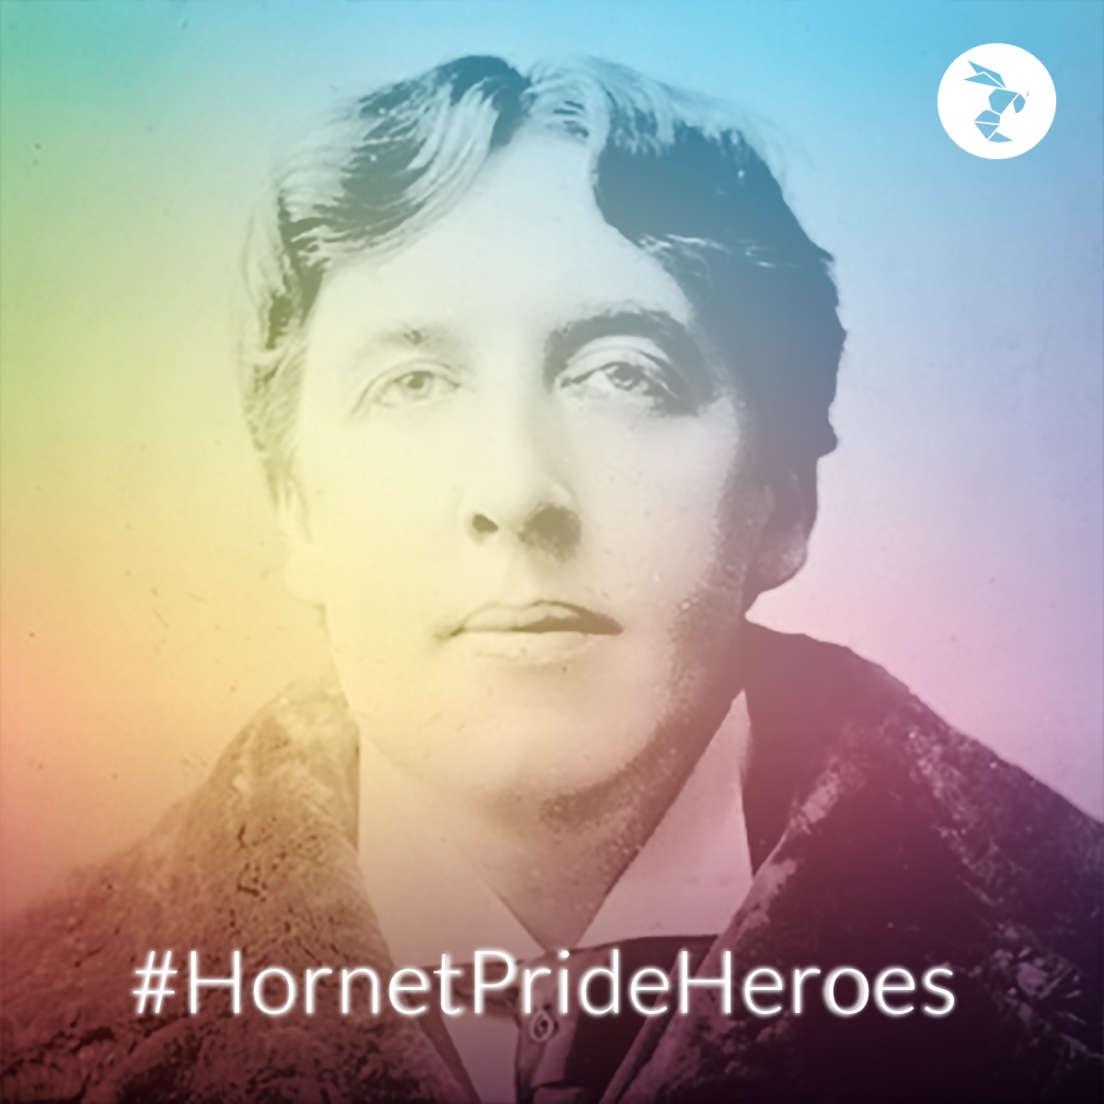 Hornet在六月推選30位LGBTQ人士為「同志英雄」(2)